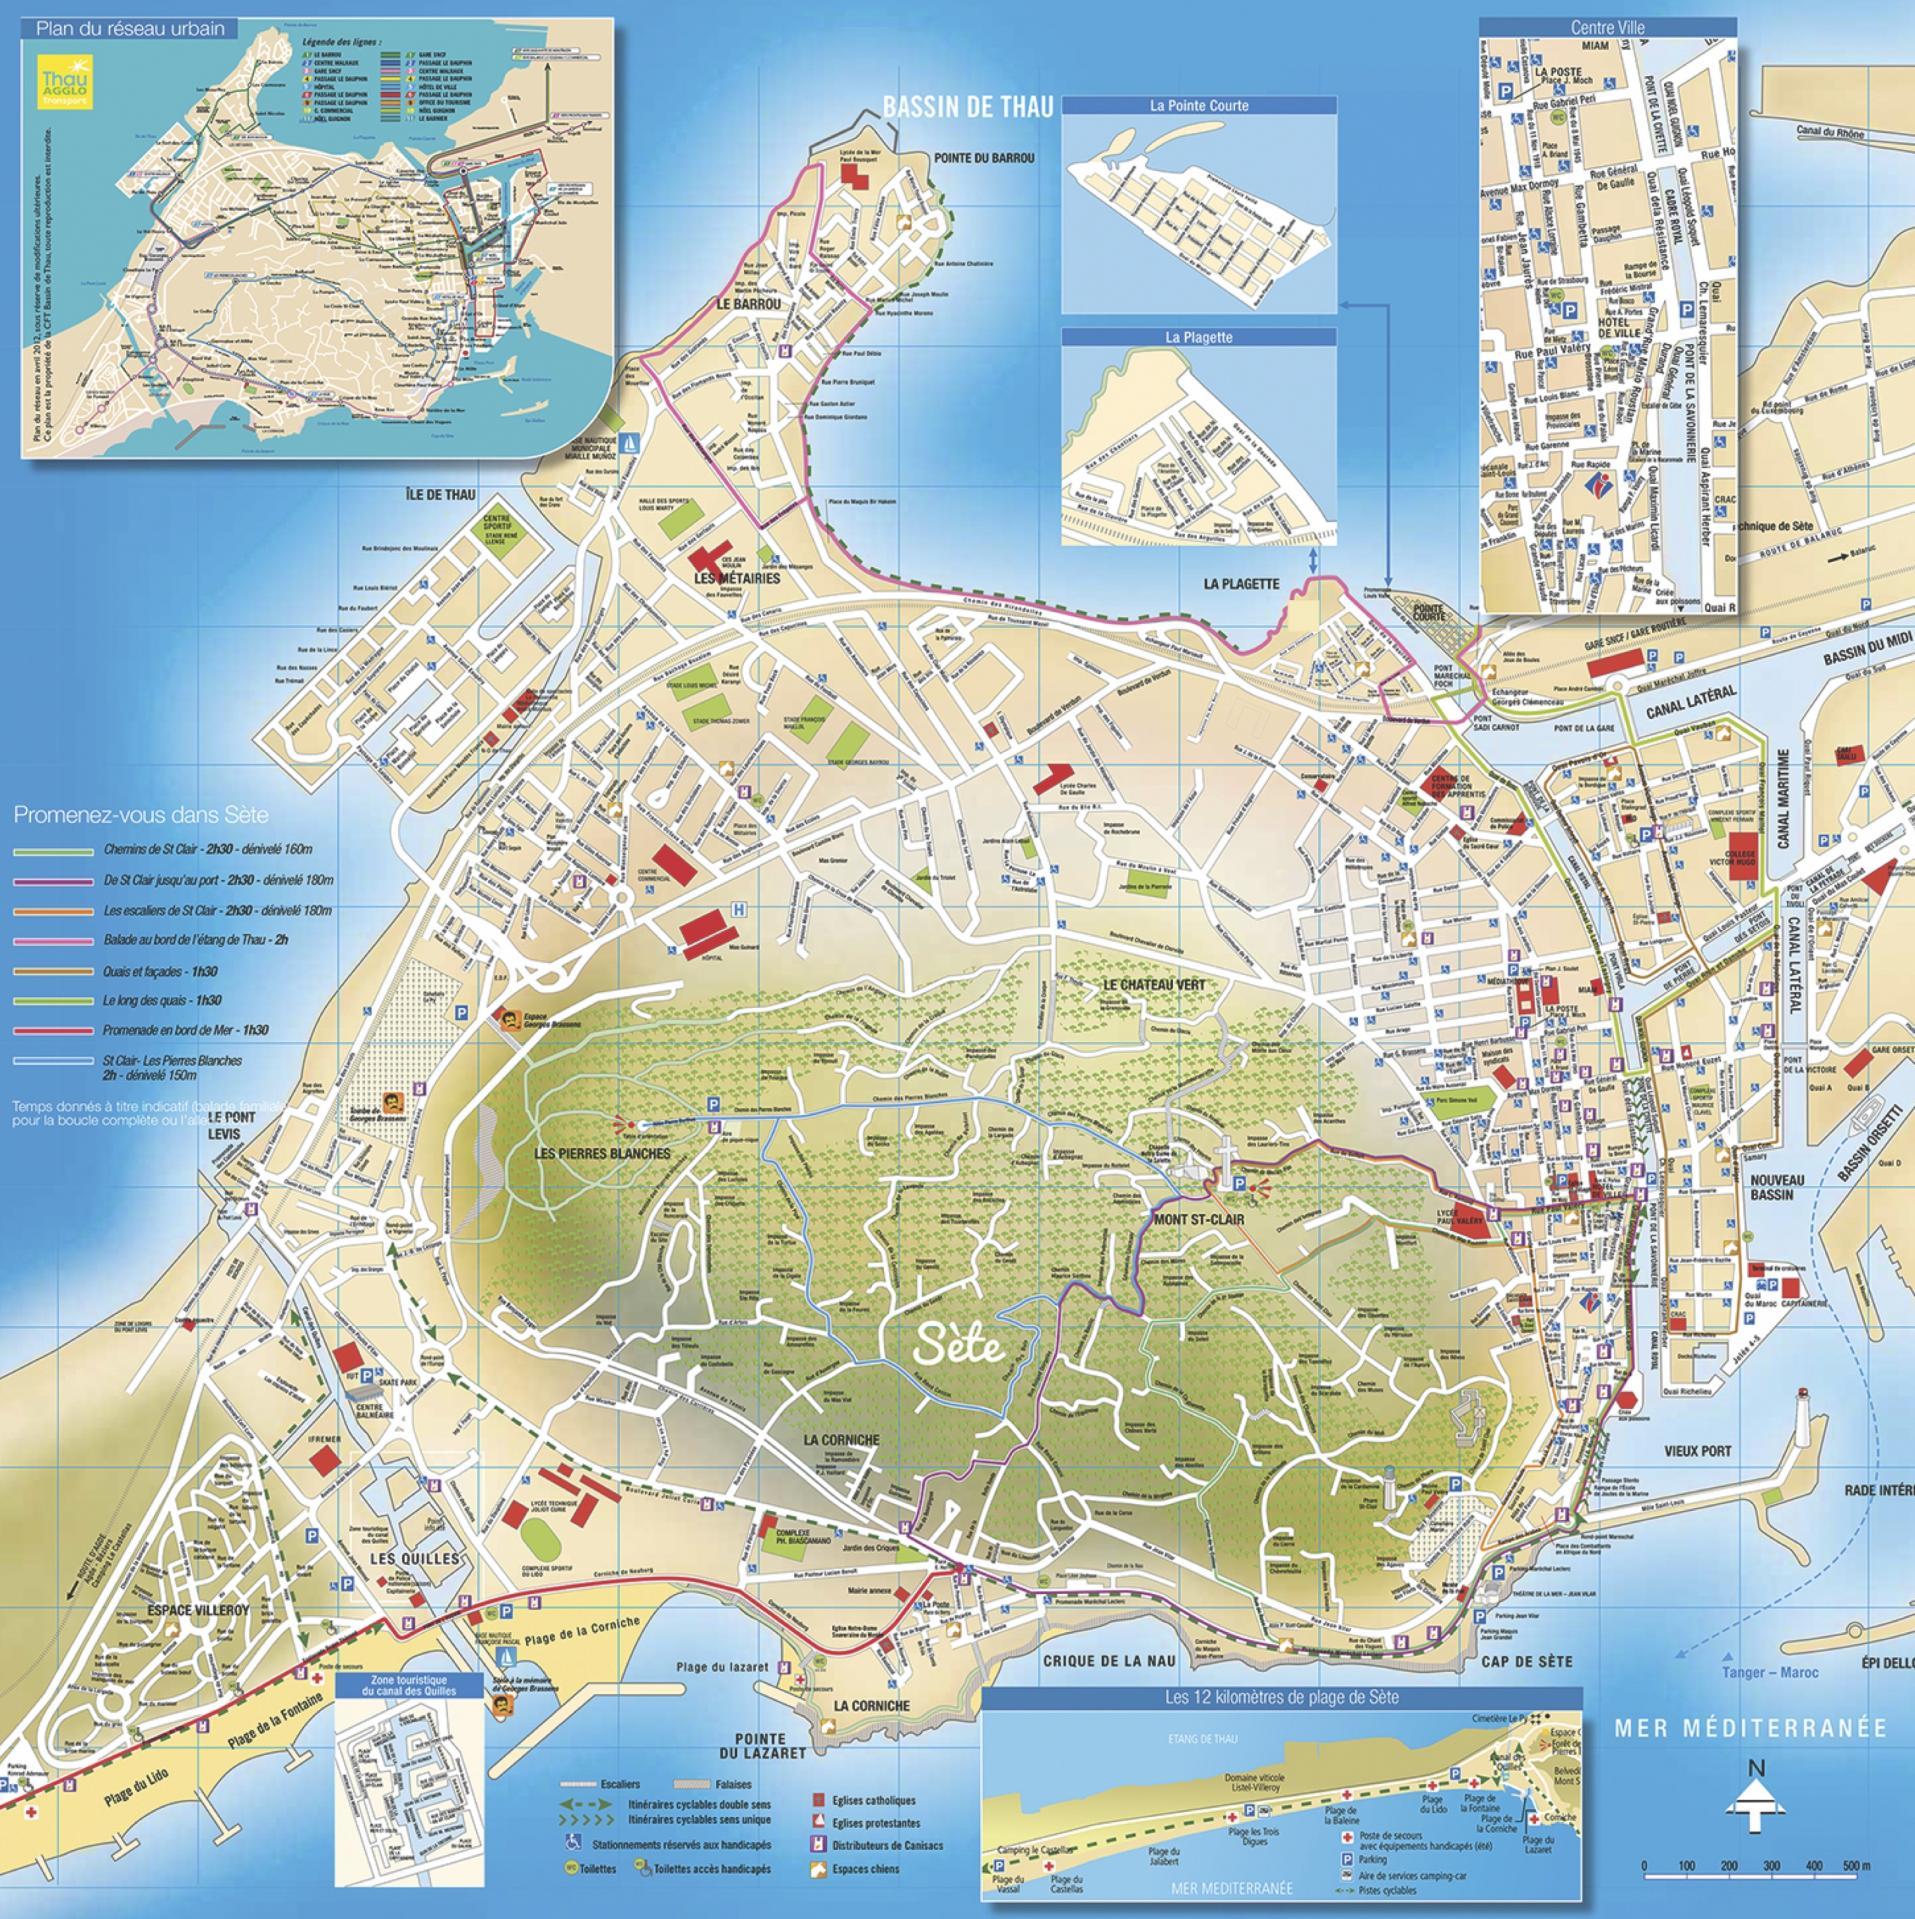 Carte Ville De Sete | My blog